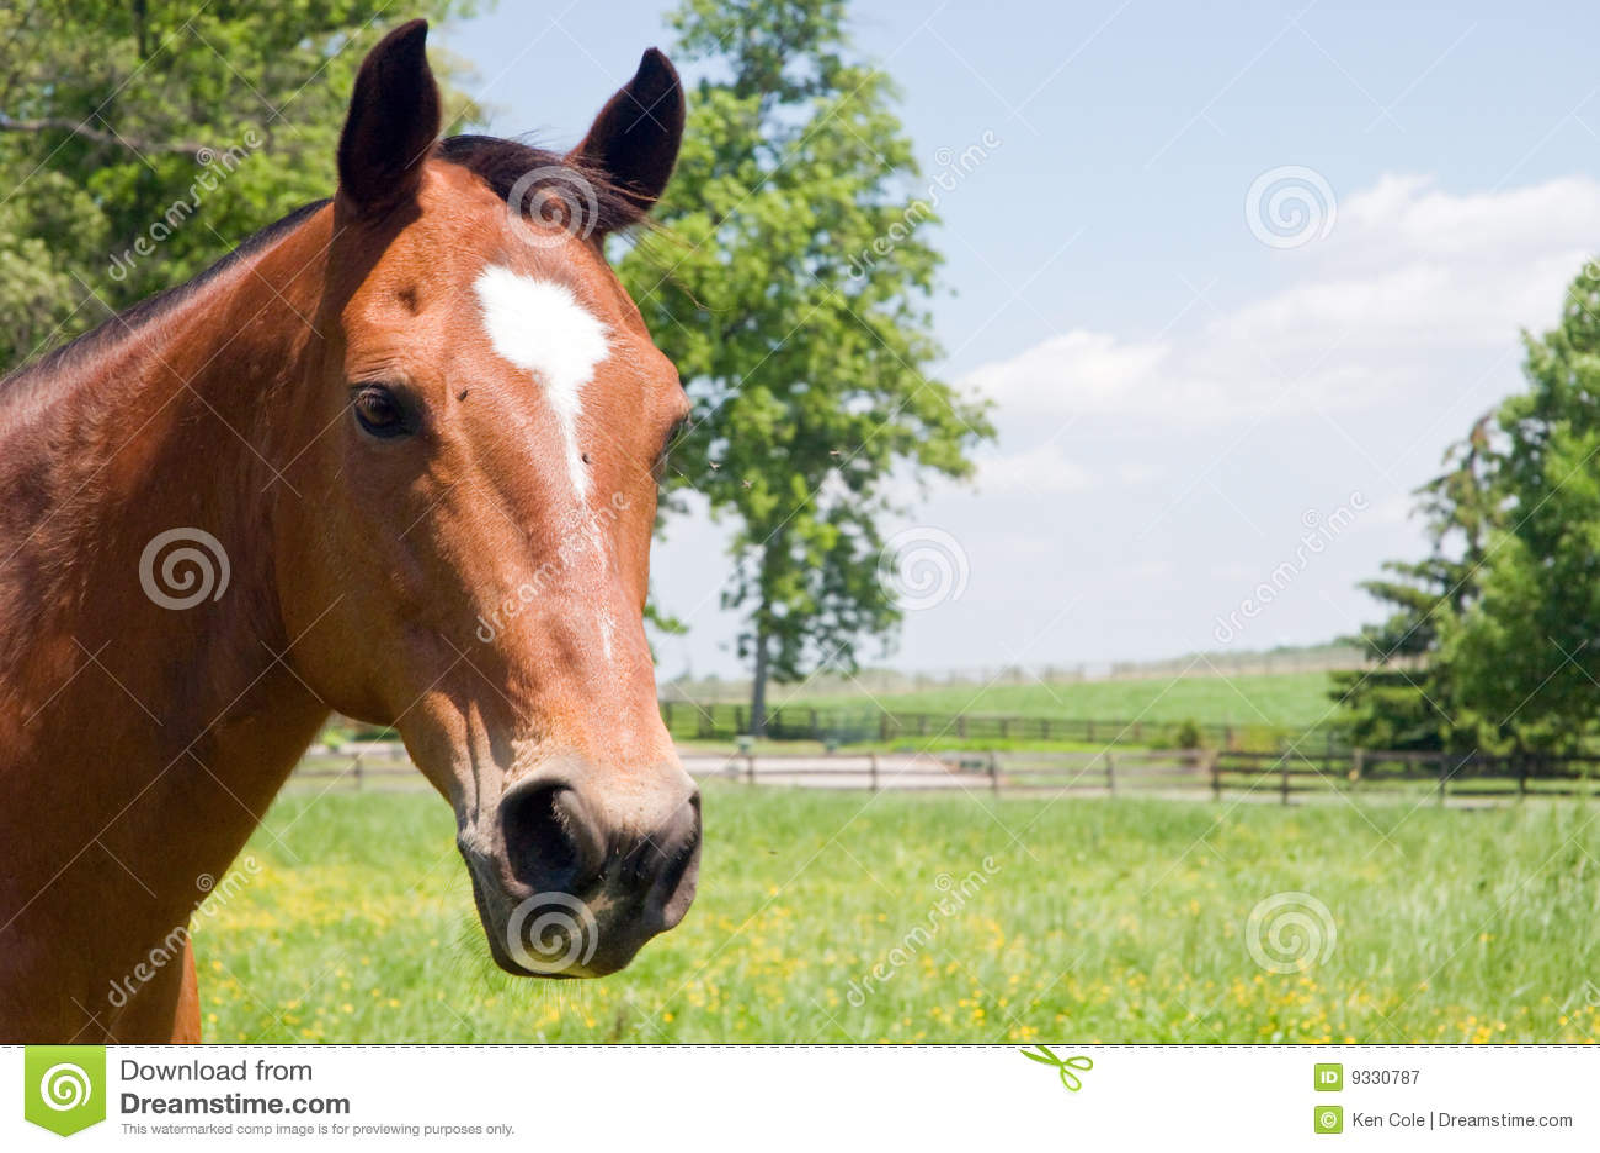 Pista del caballo marrón